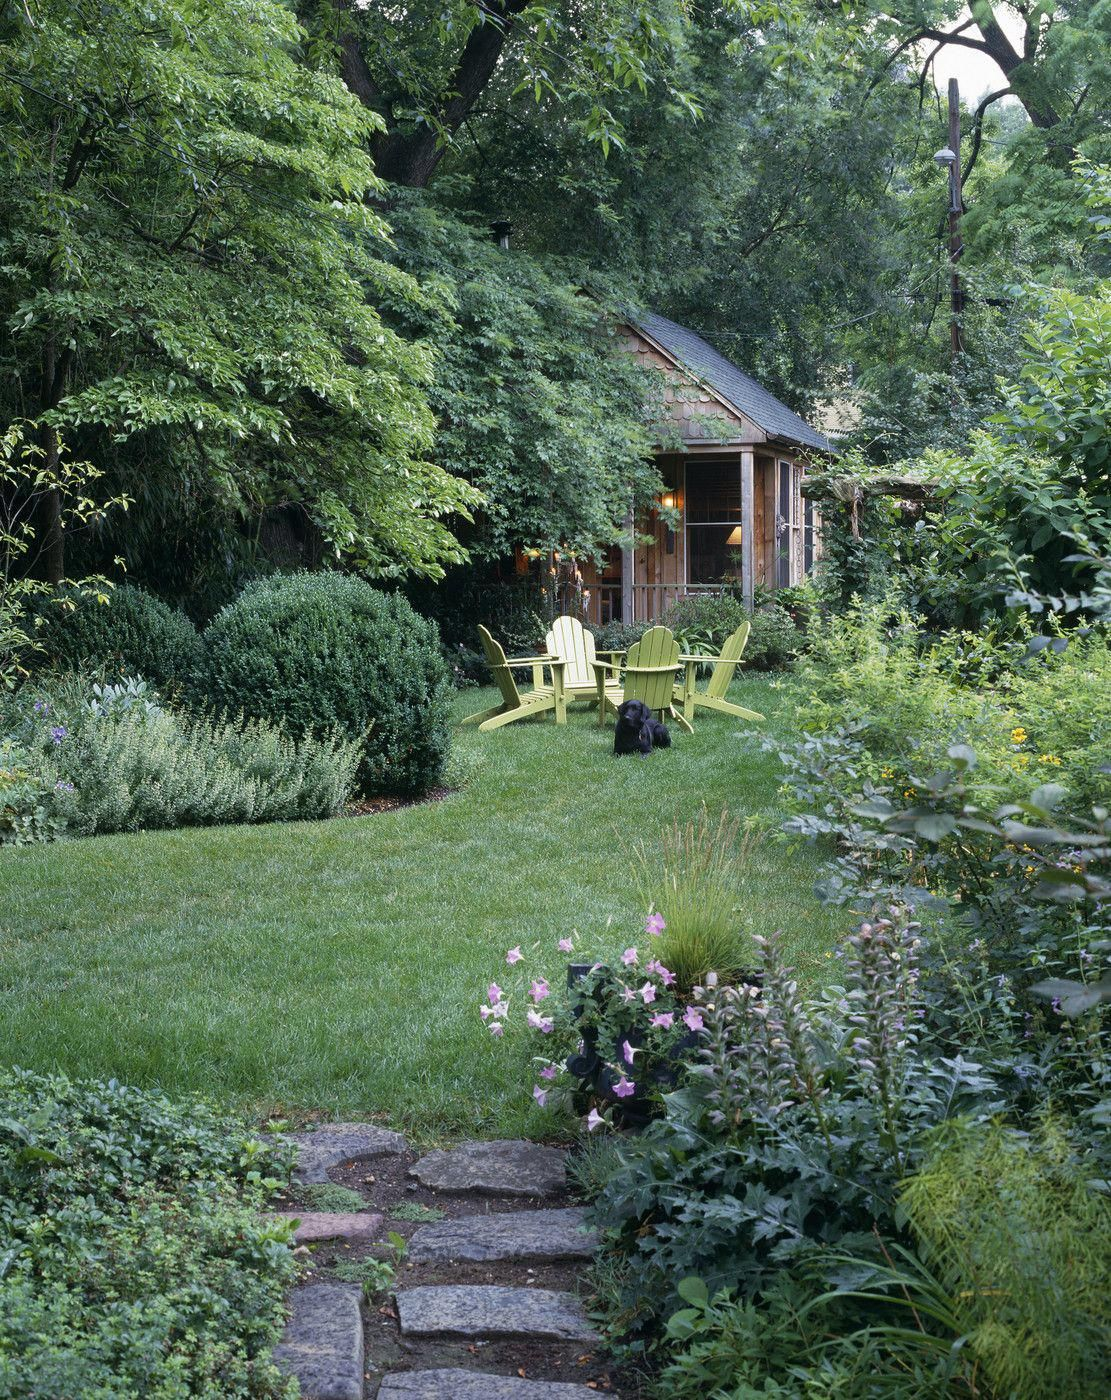 Landscape Gardening Design Software Landscape Gardening